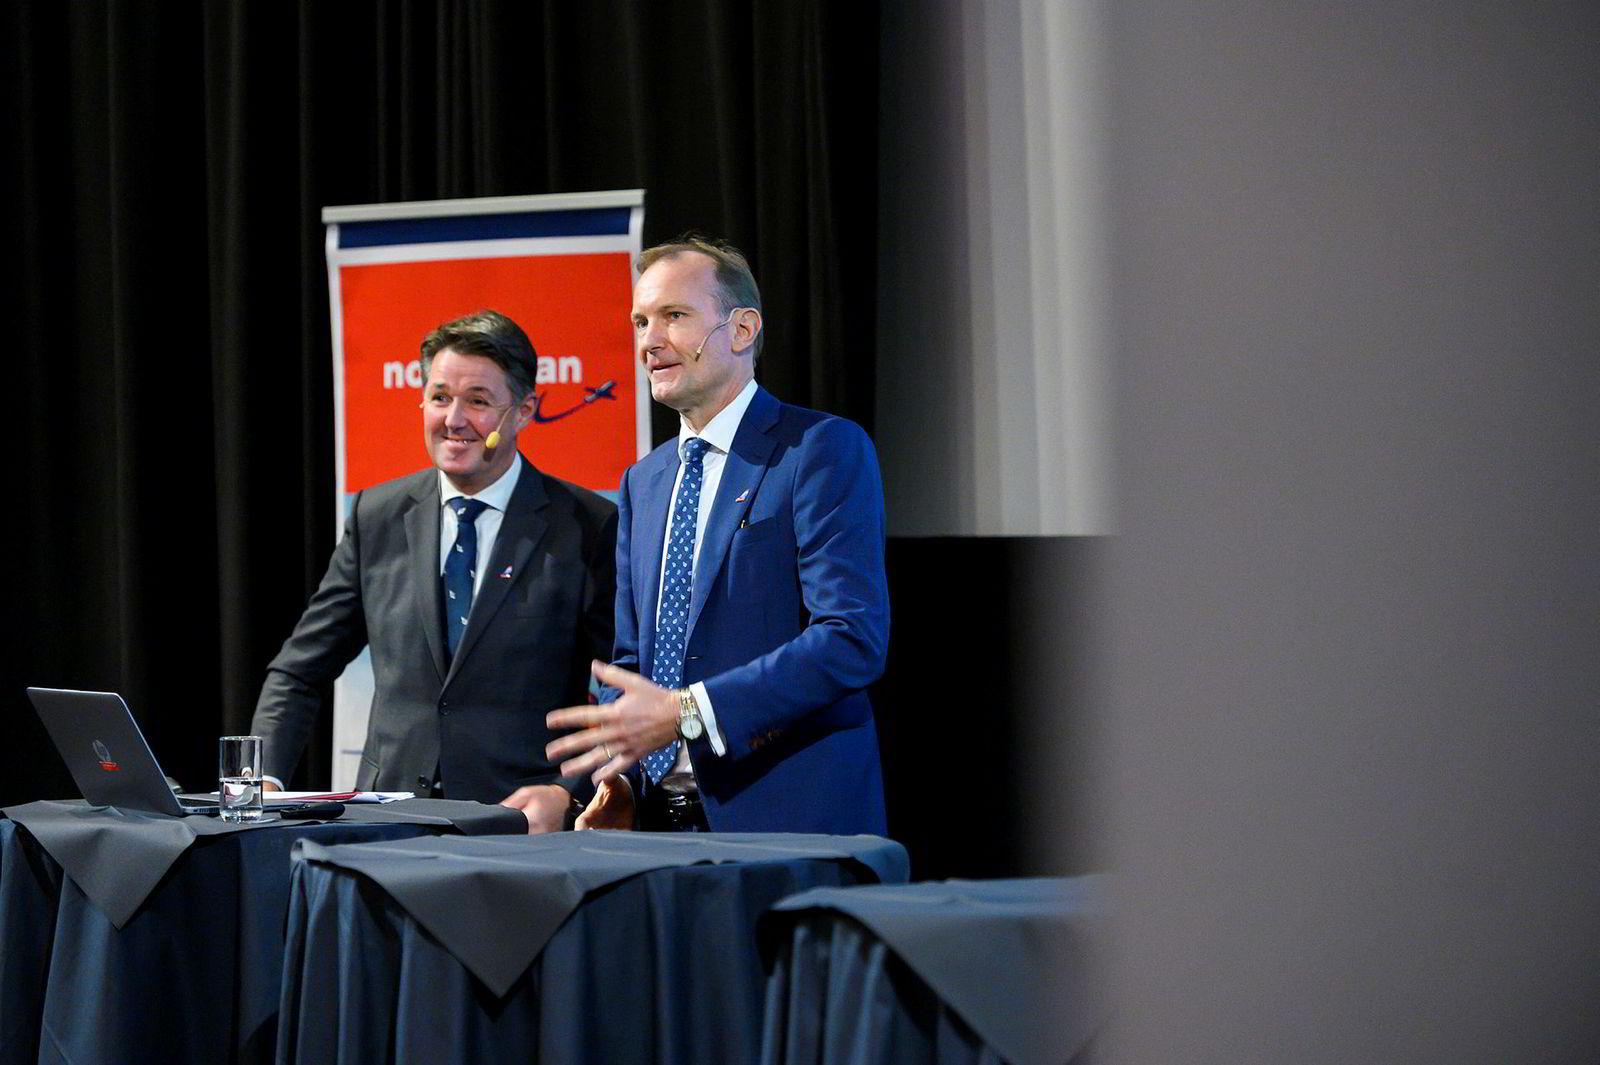 Midlertidig toppsjef Geir Karlsen (til venstre) og styreleder Niels Smedegaard la frem kvartalstall for under to uker siden. Den gang sa de at påfyll av frisk kapital ikke var et «hovedscenario». Det endret seg raskt.